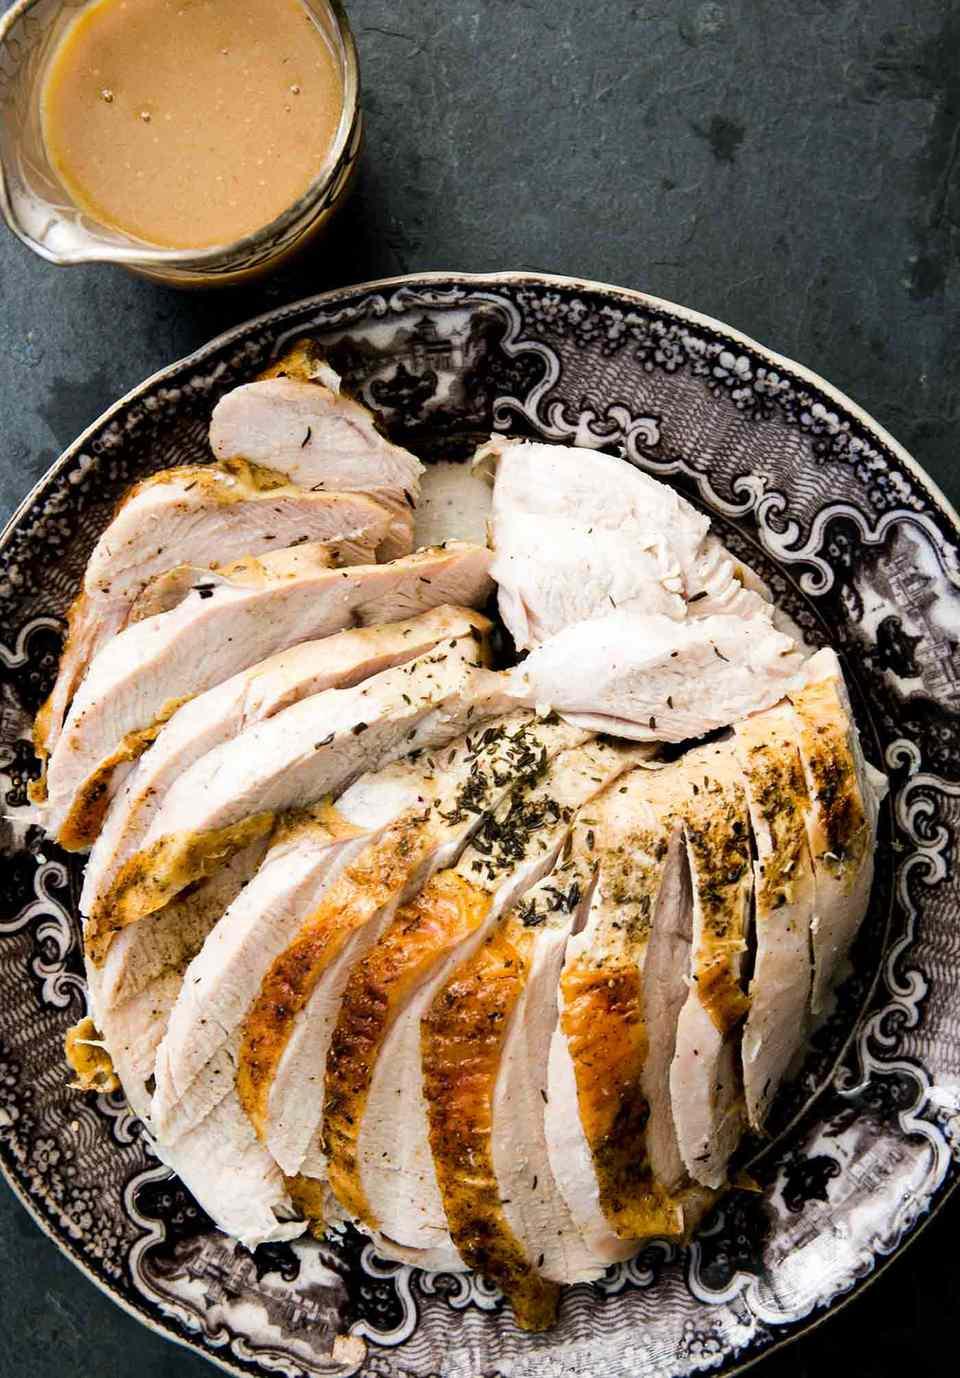 Roast Turkey Breast with Garlic Gravy